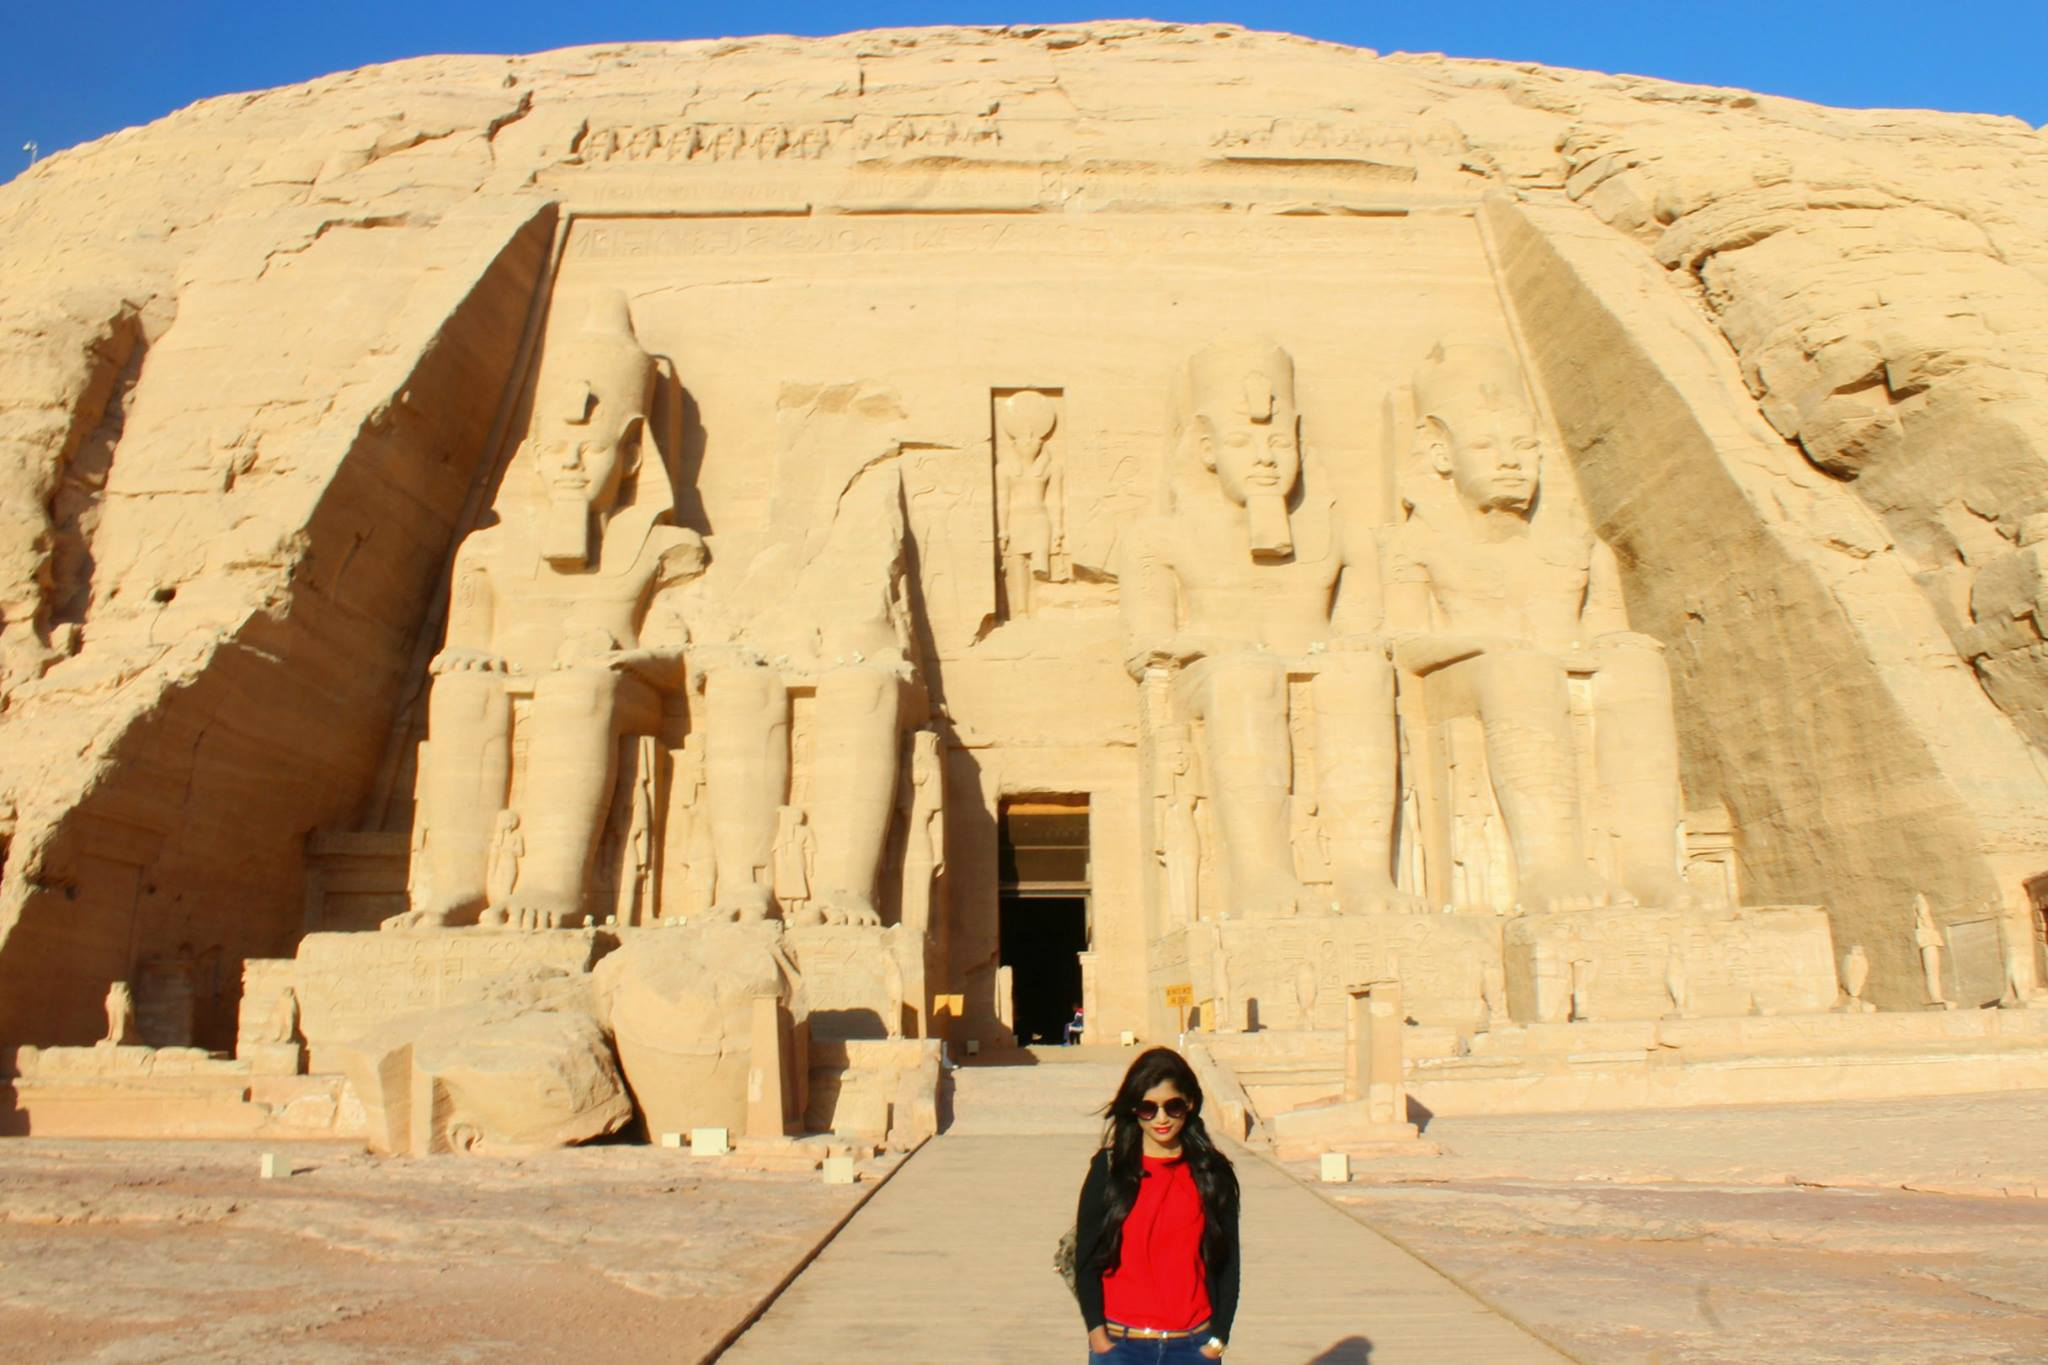 Stand in awe of Ramses II at Abu Simbel